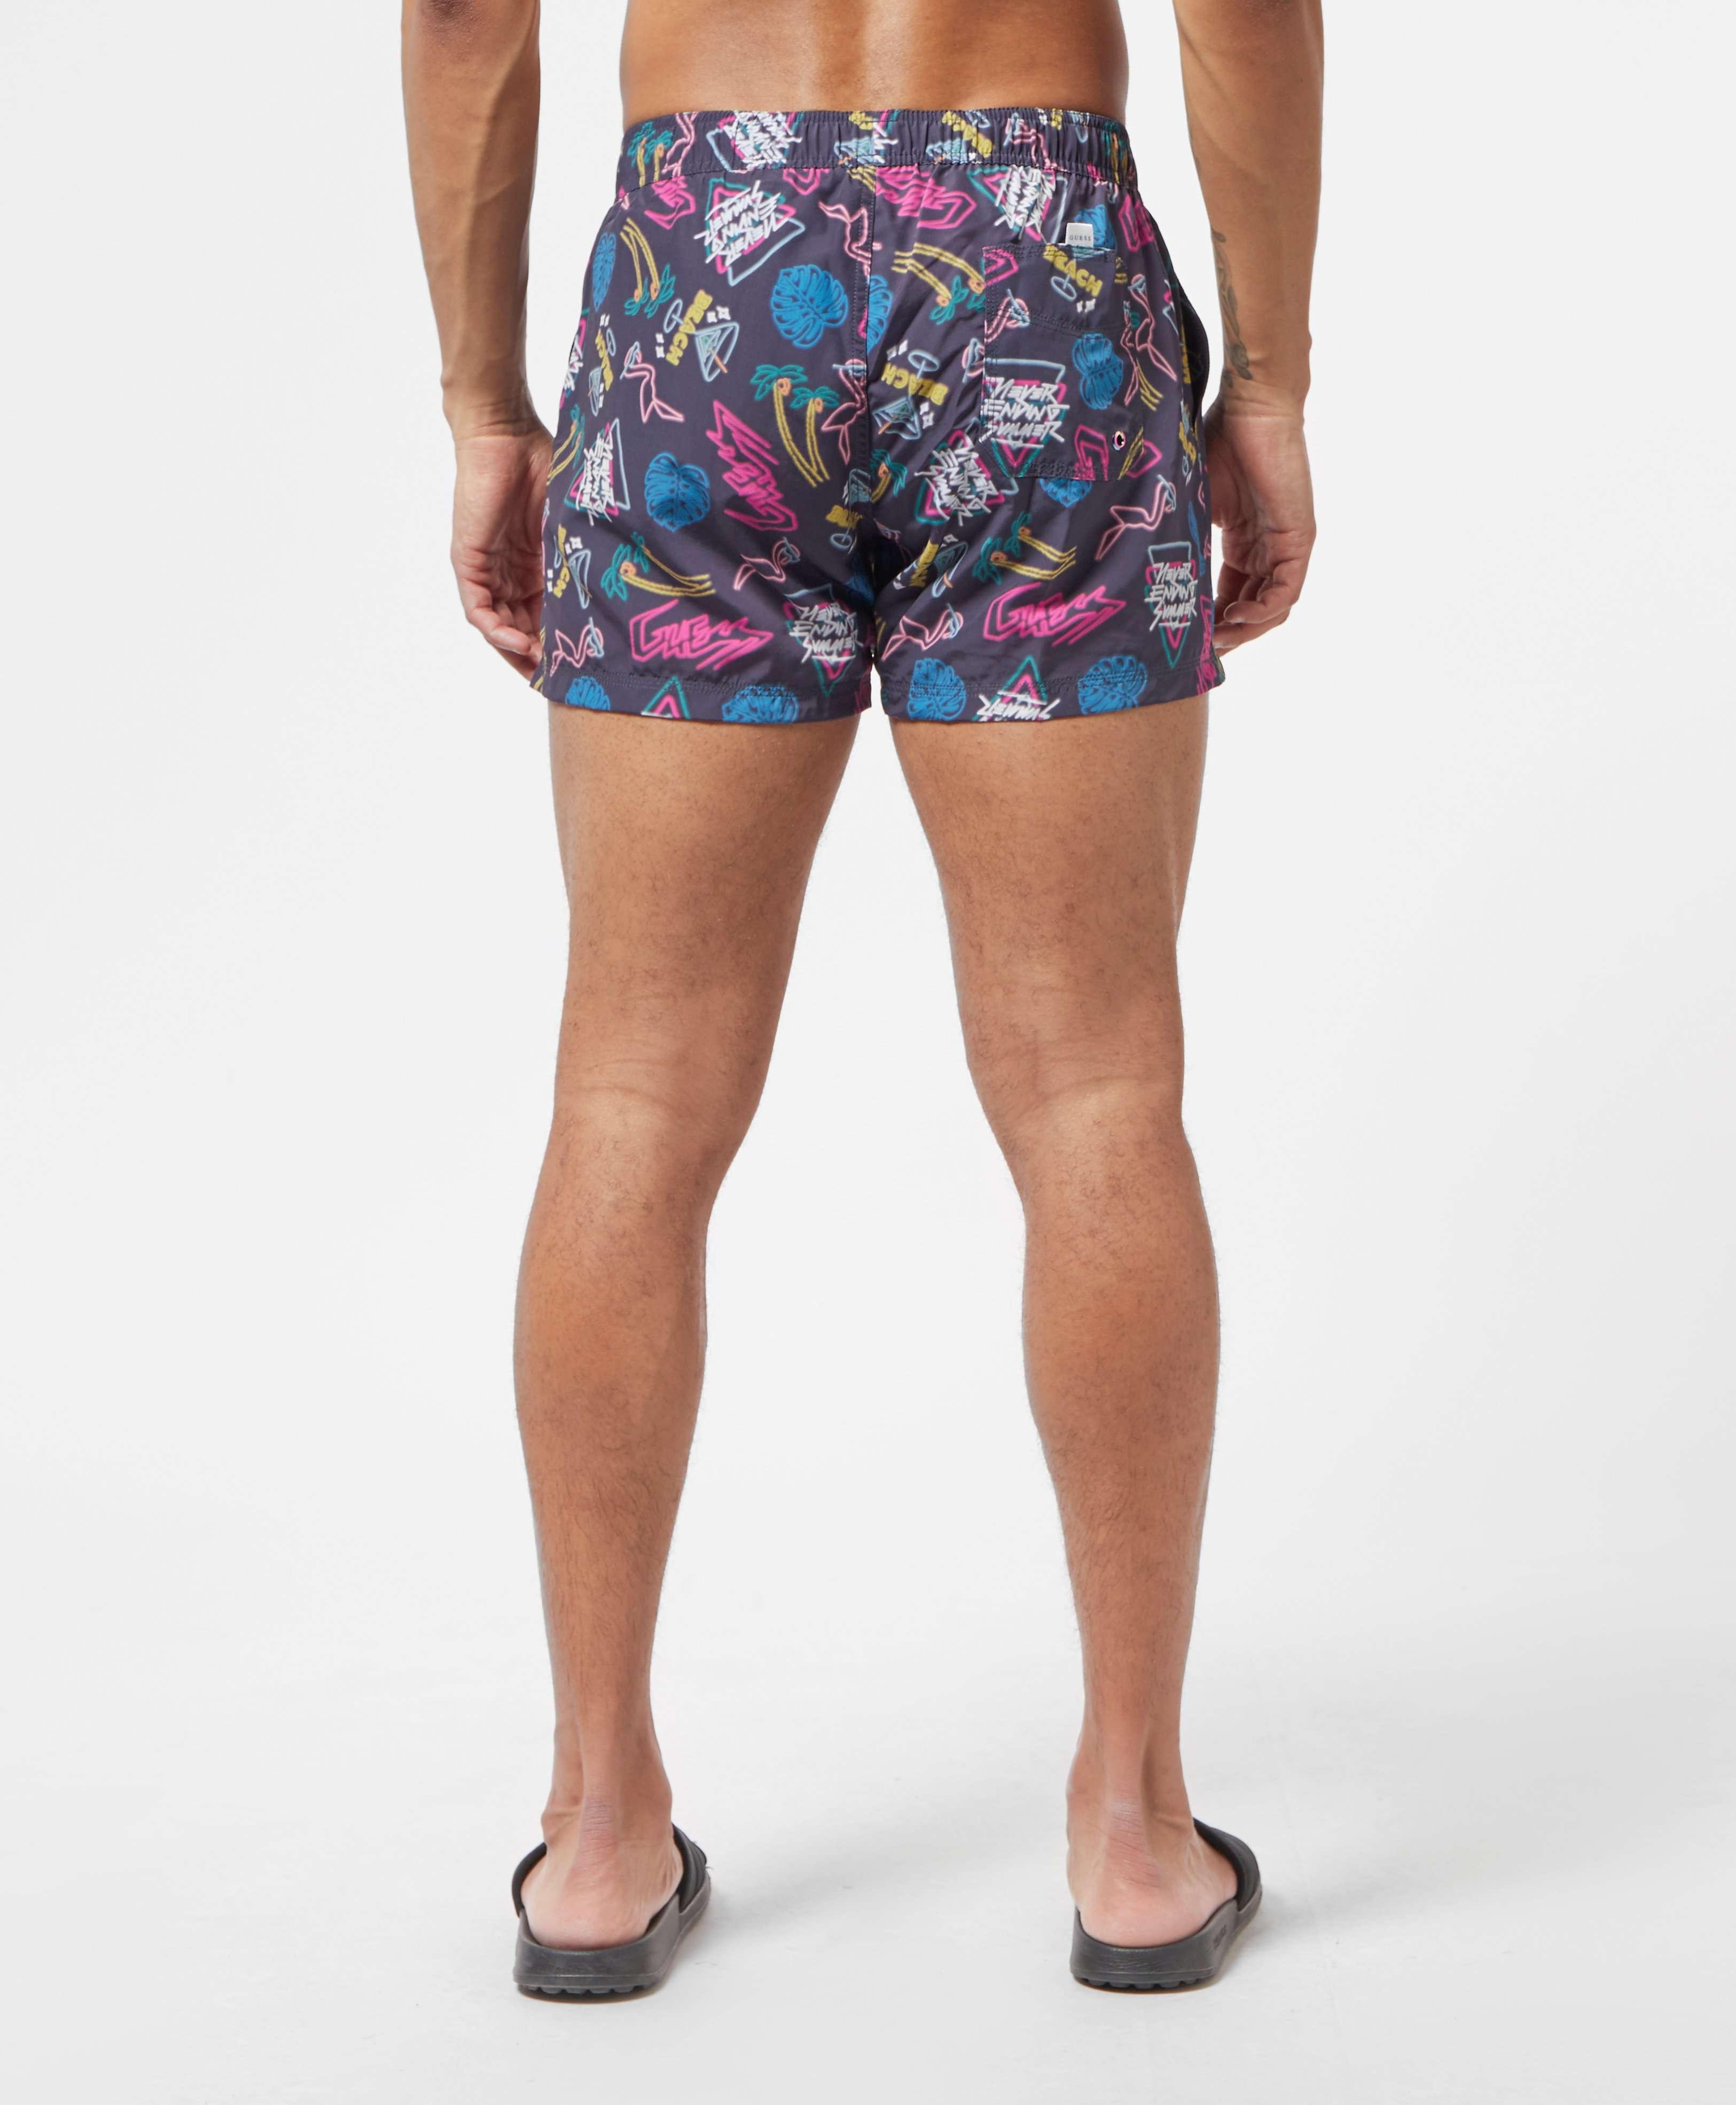 Guess Neon Swim Shorts